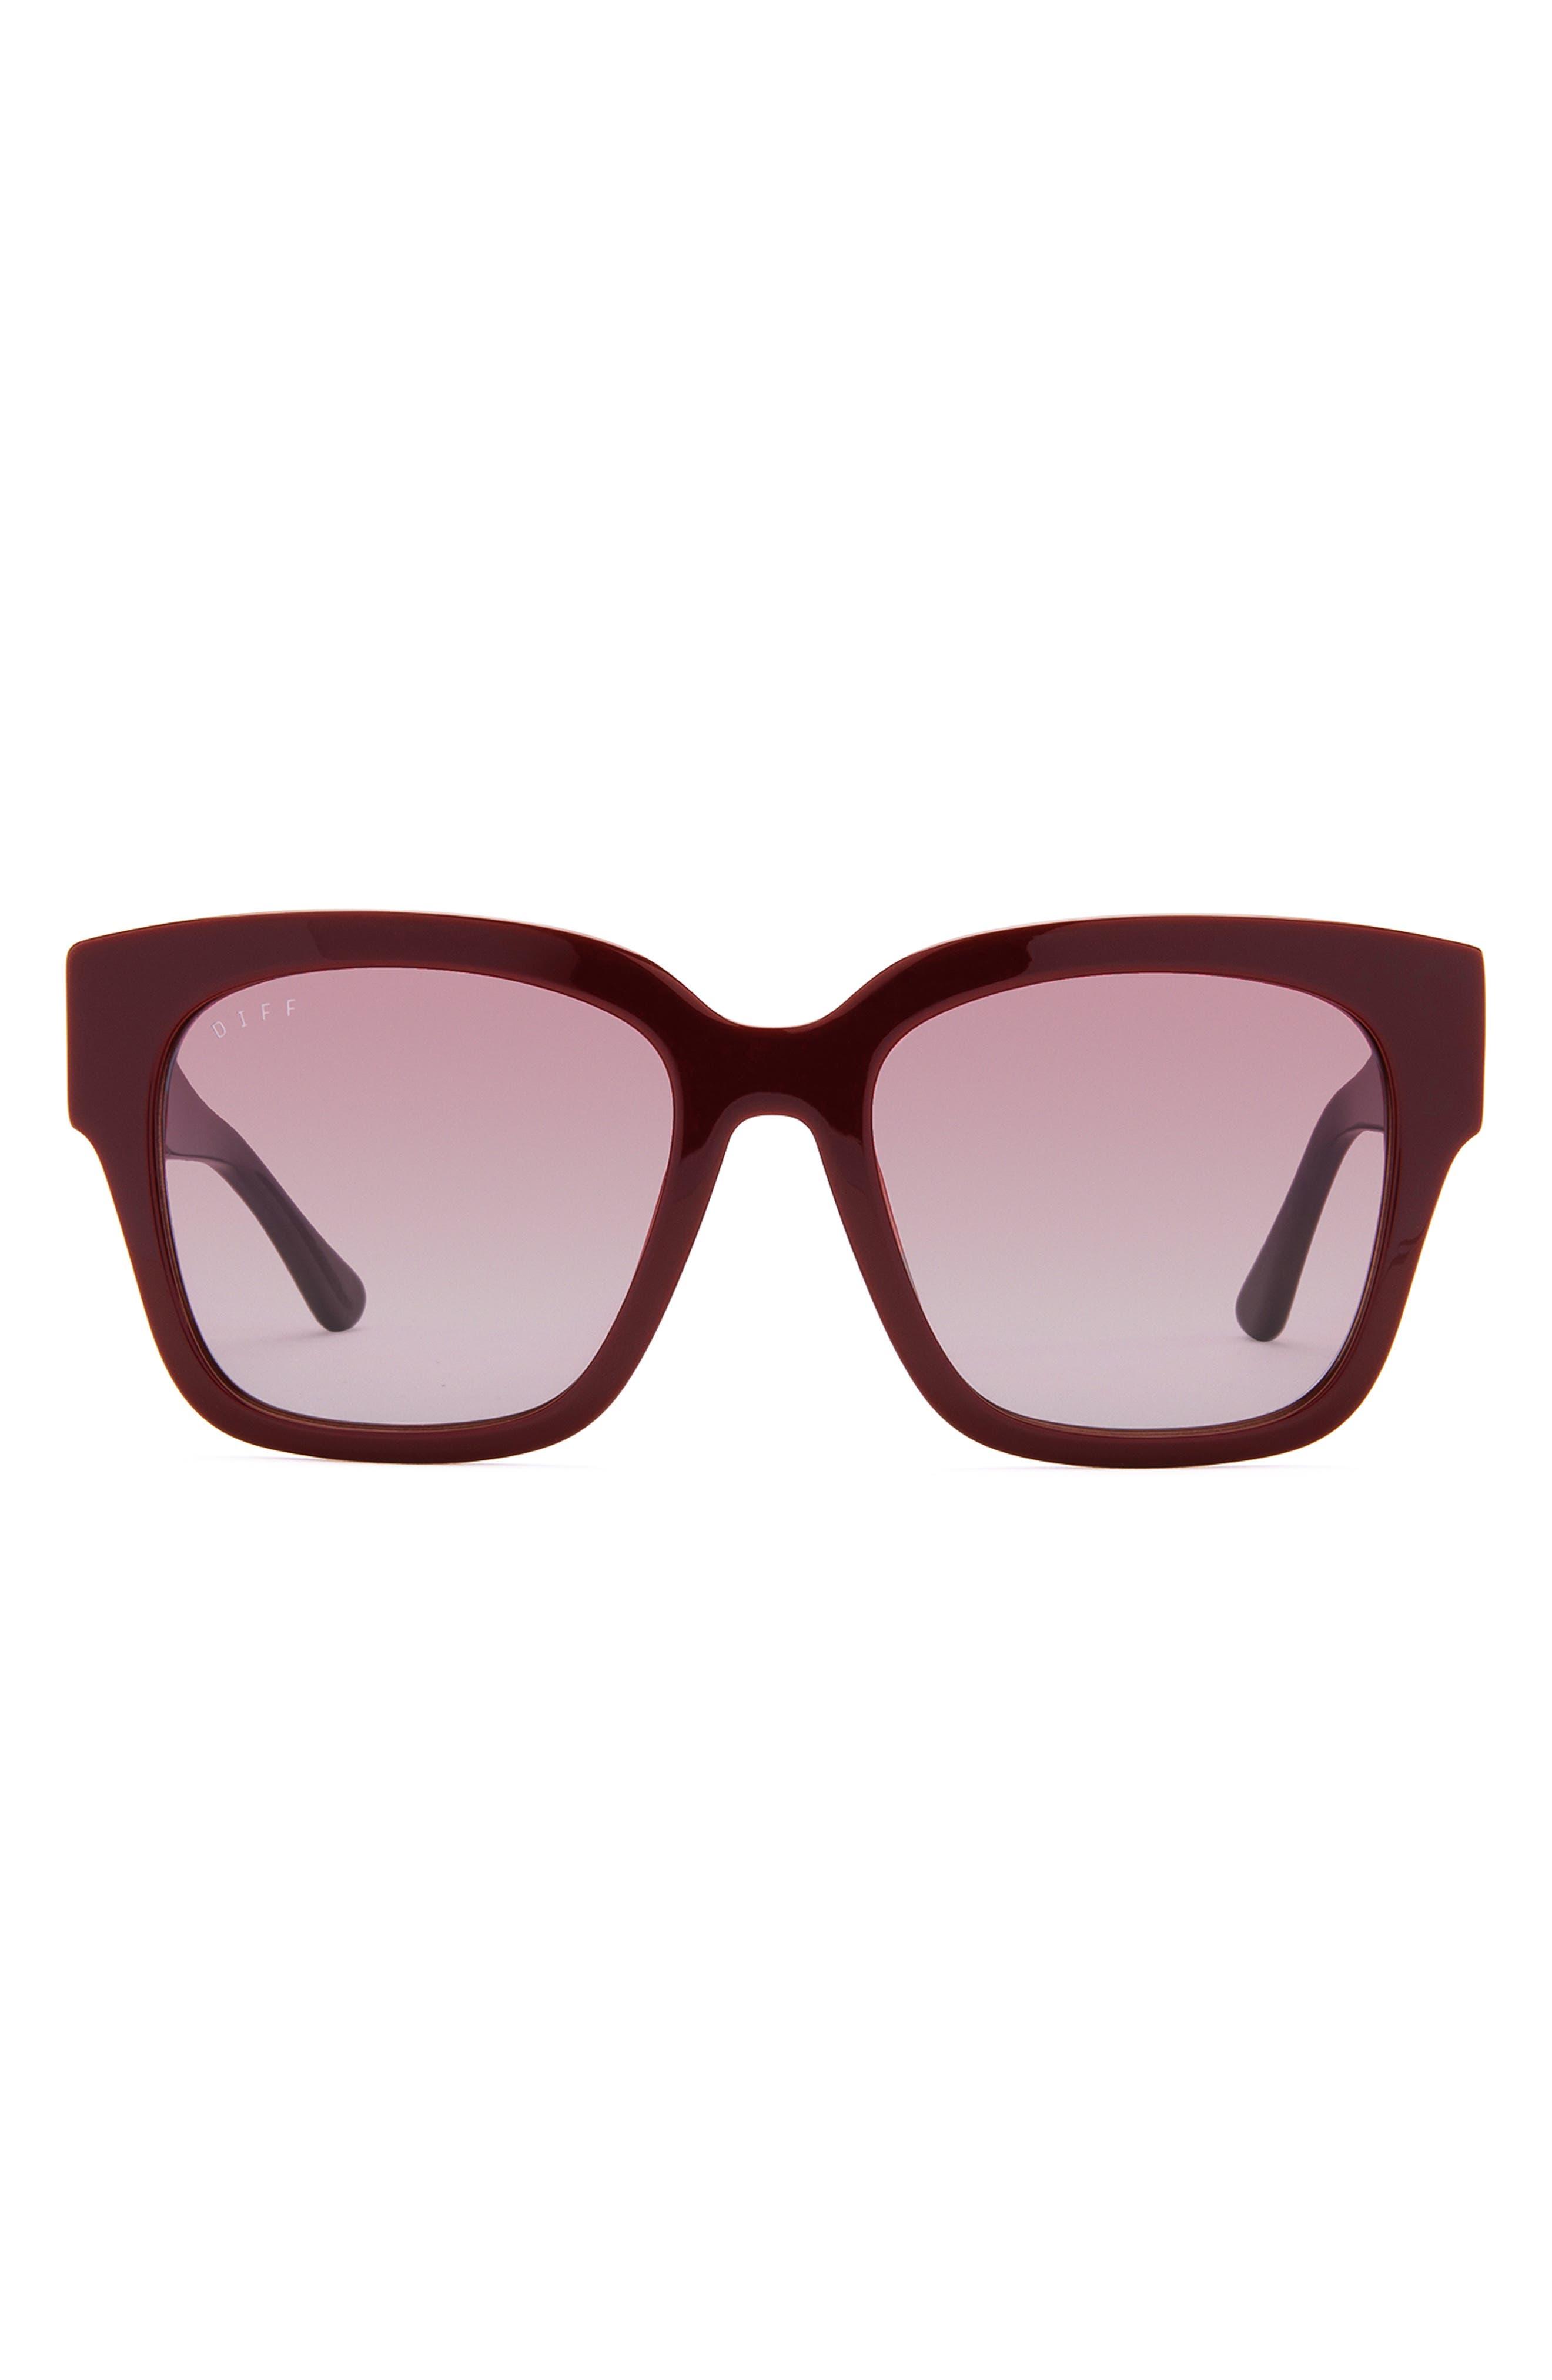 Bella Ii 53mm Gradient Square Sunglasses